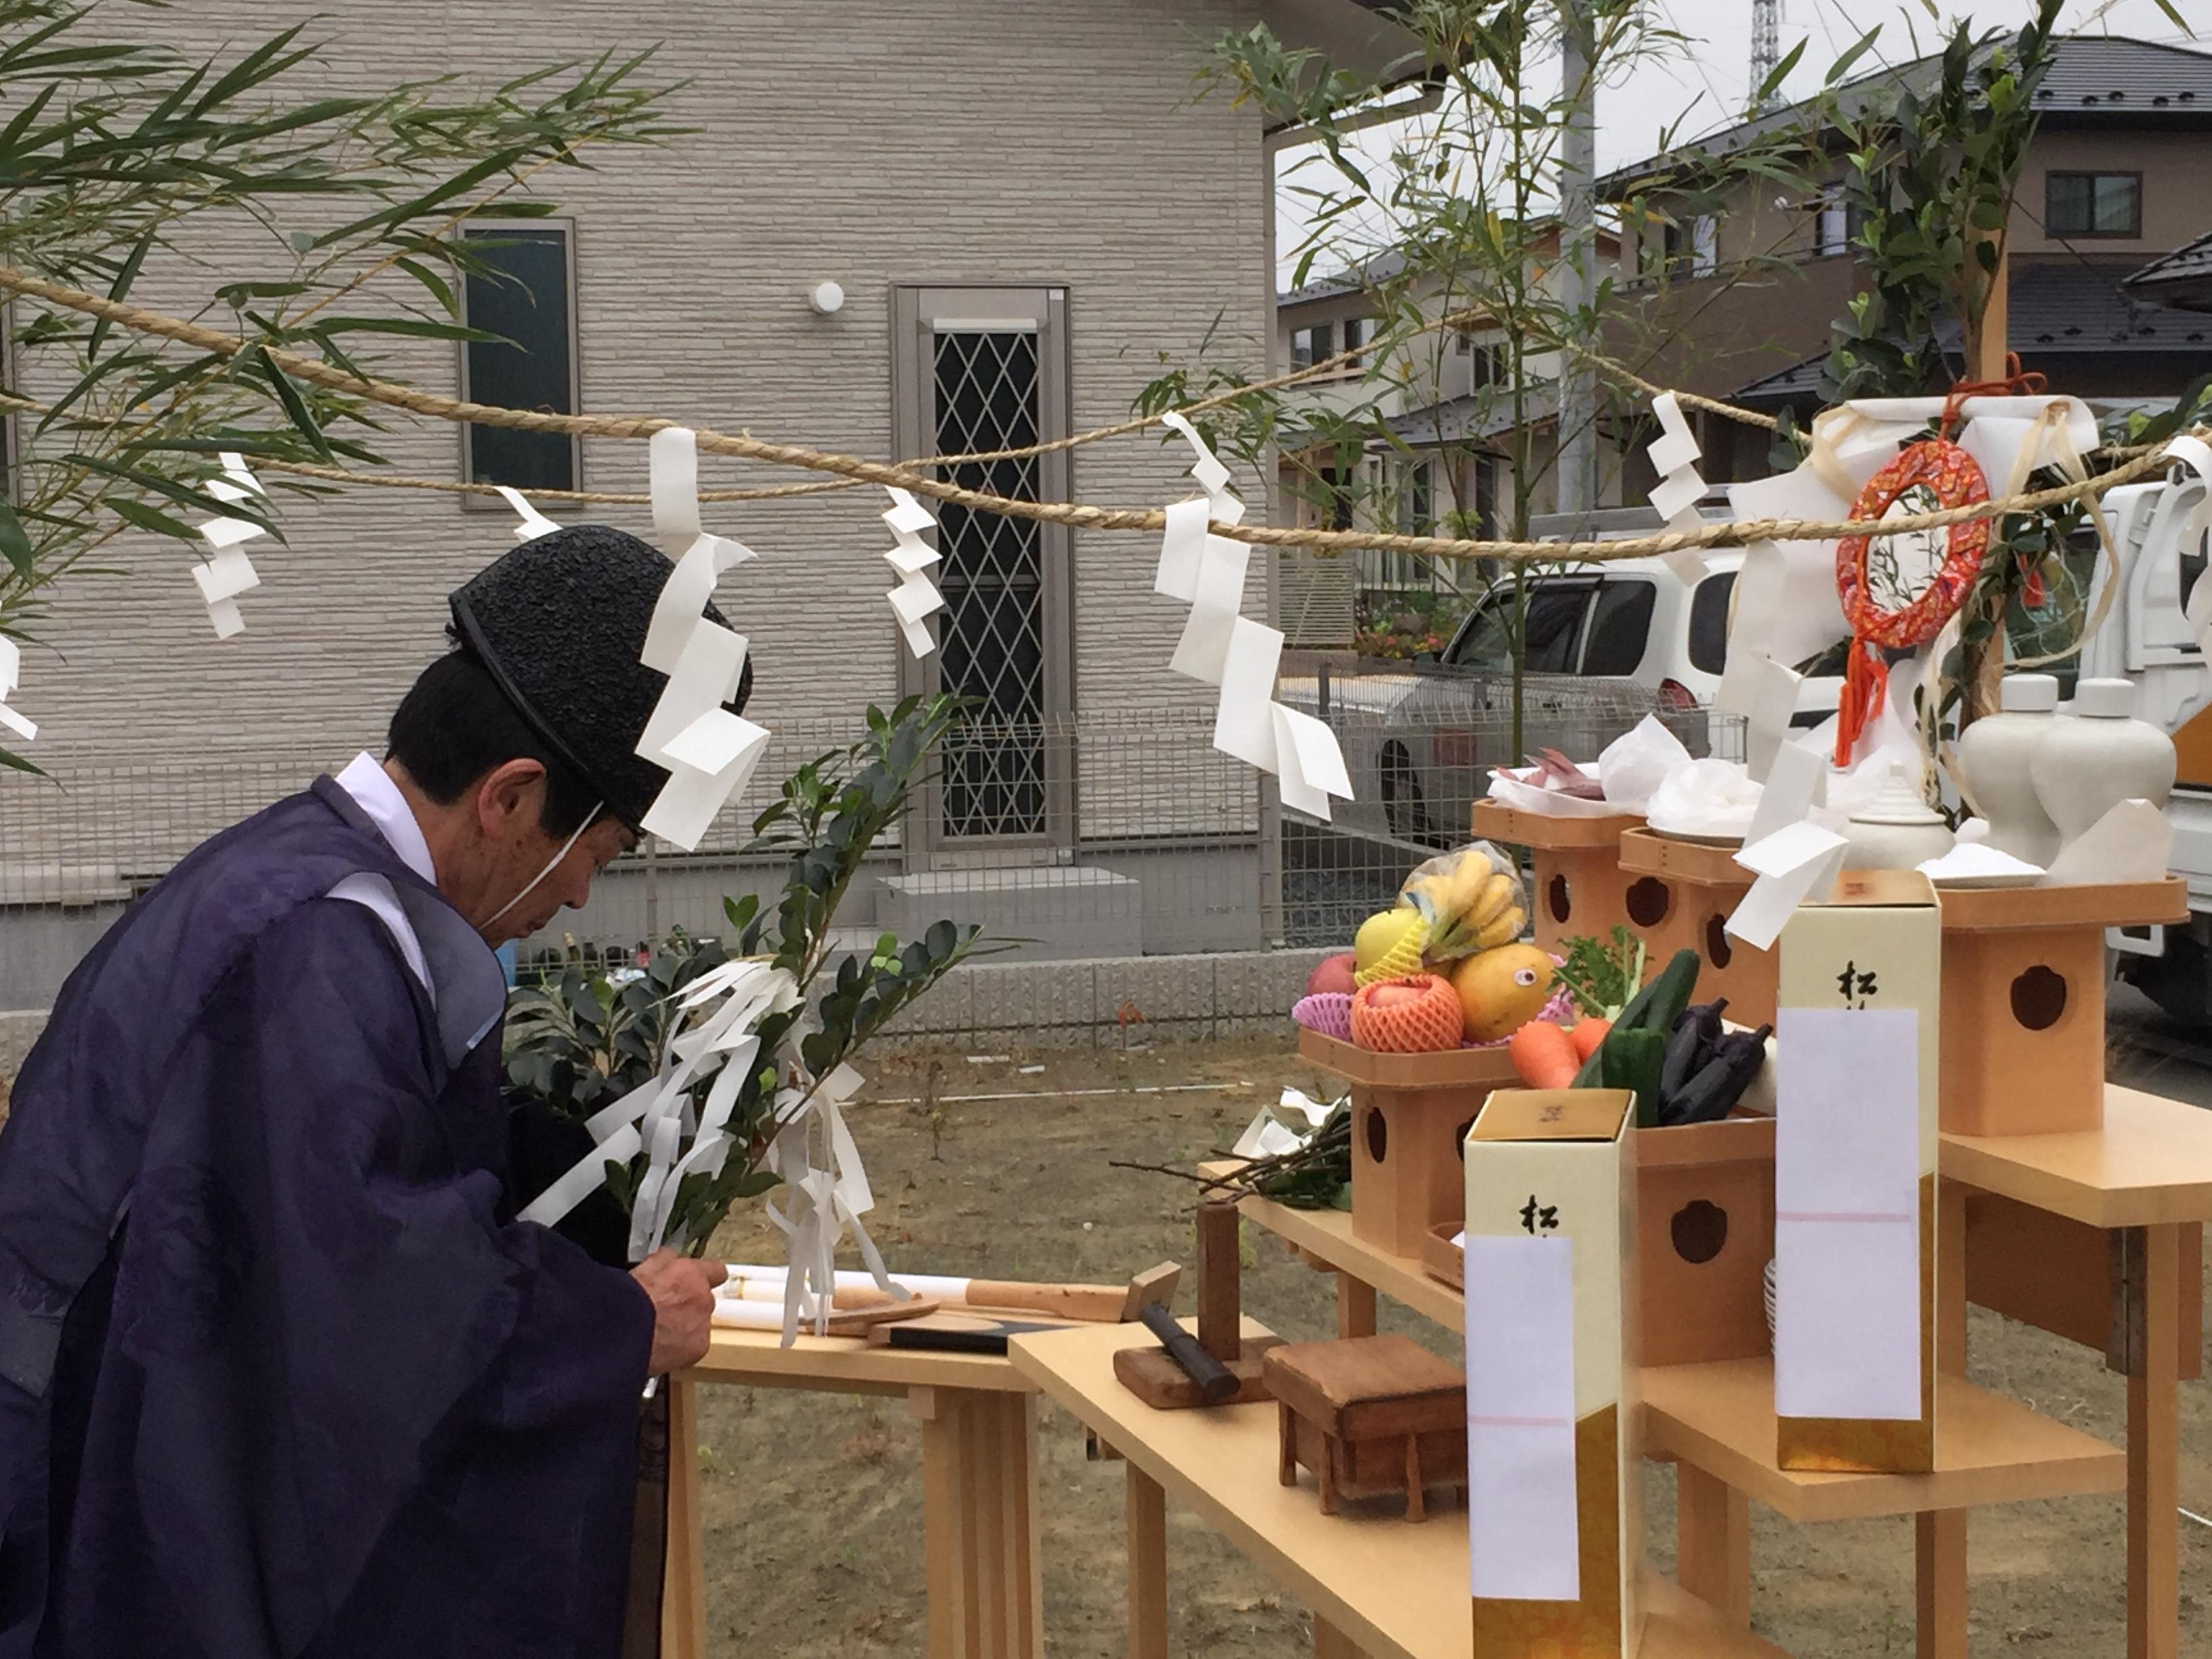 Vol.25【石巻市新築コラム】地鎮祭(じちんさい)